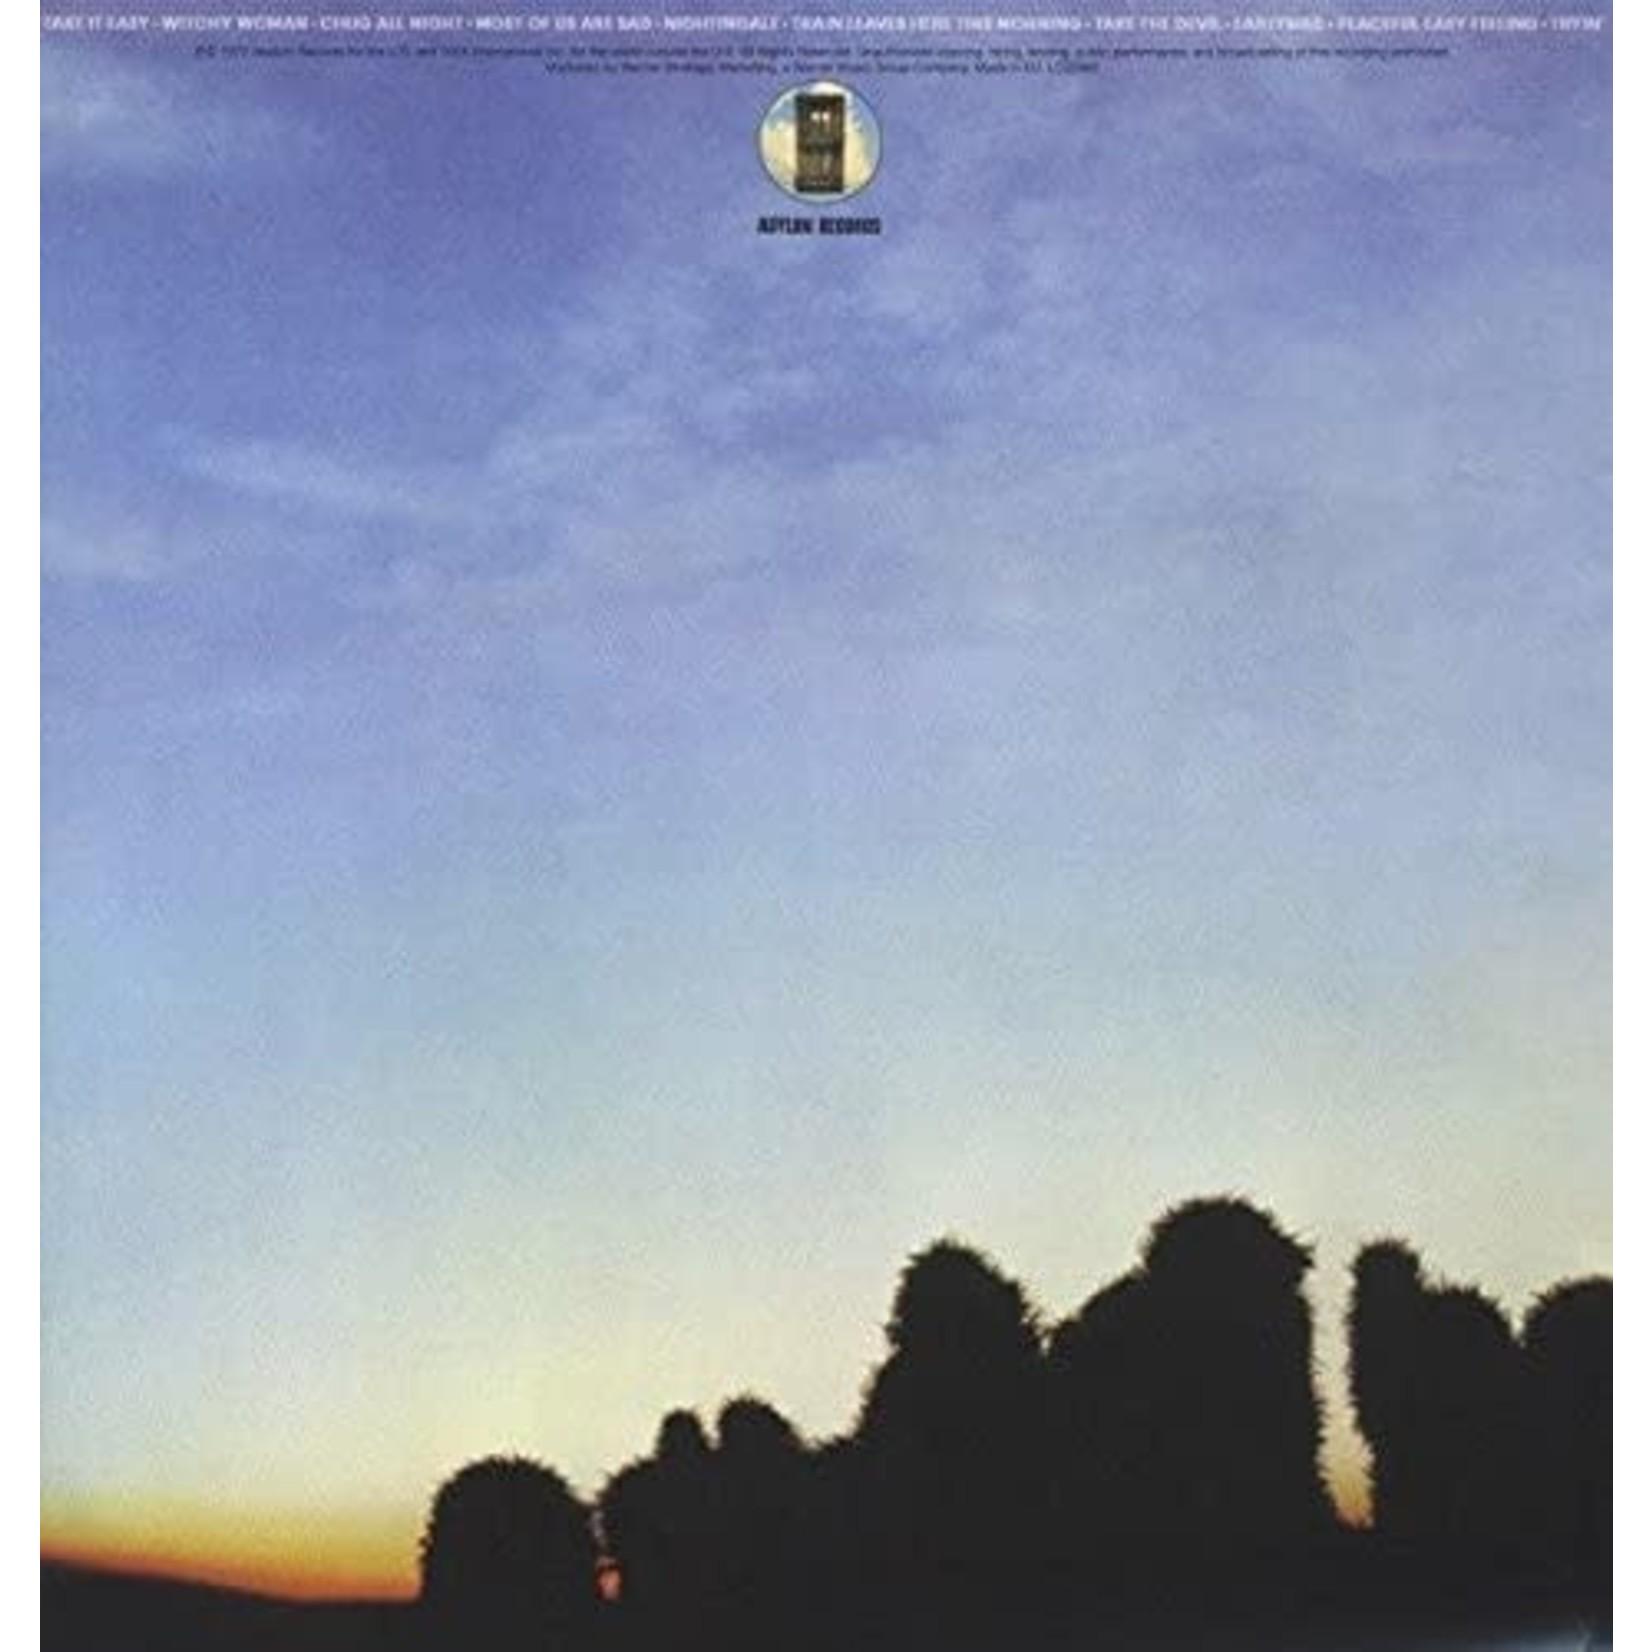 THE EAGLES - EAGLES (LP)